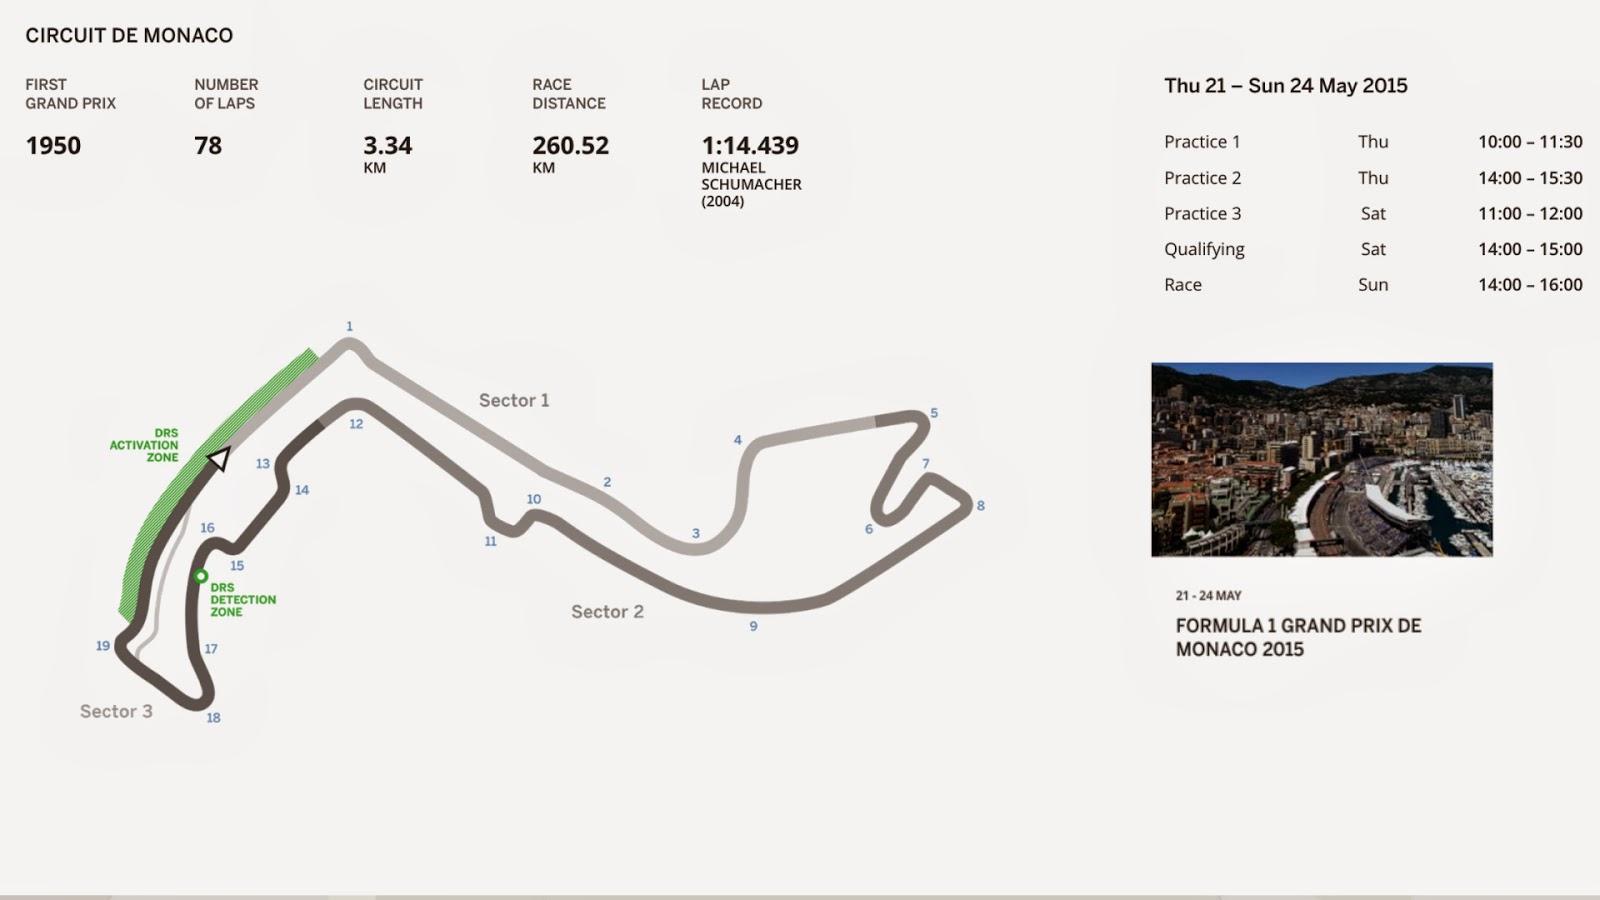 Pocket Hobby - www.pockethobby.com - F-1 - Monaco Race